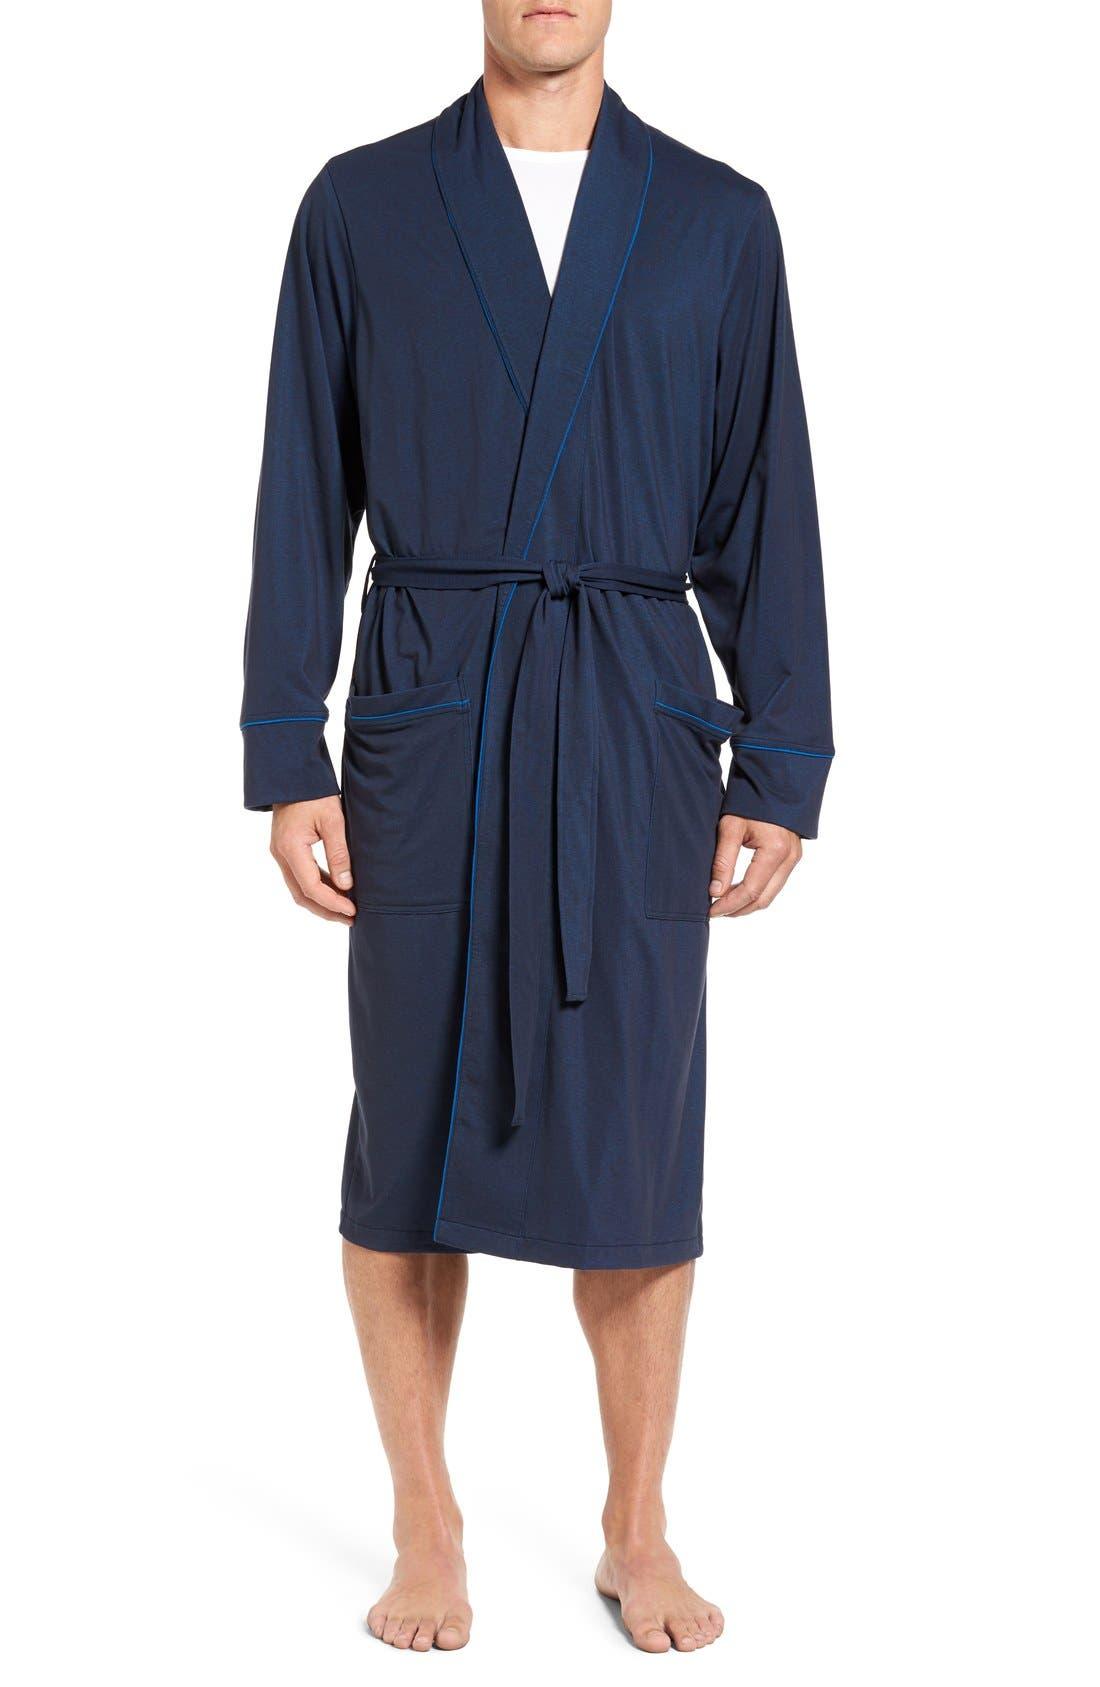 Main Image - Nordstrom Men's Shop Cotton Blend Robe